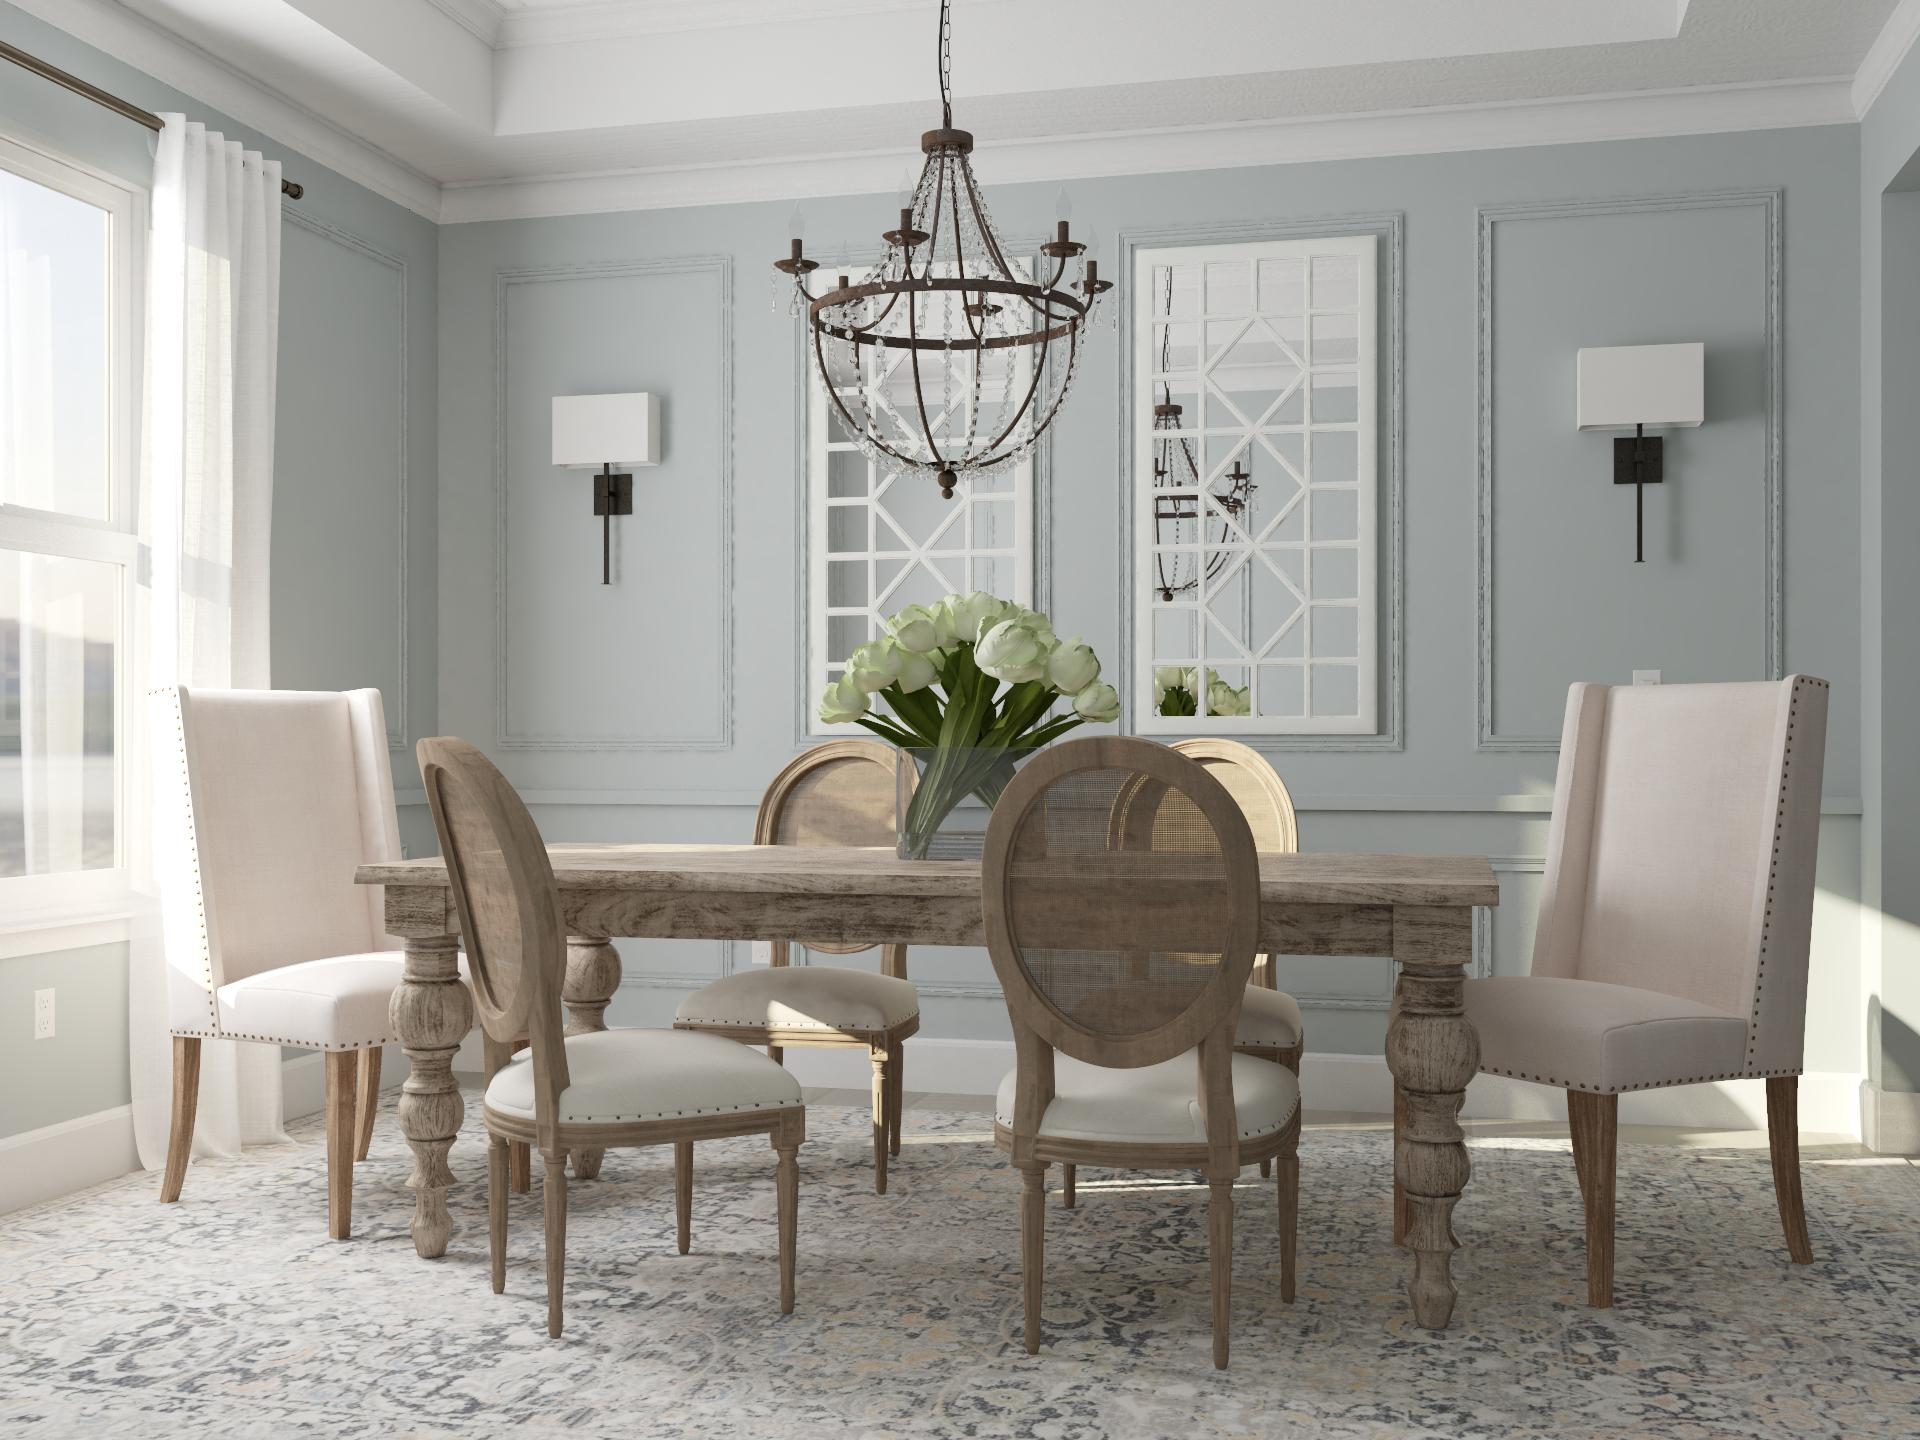 Elegant Symmetry   Traditional-Style Dining Room Design Ideas